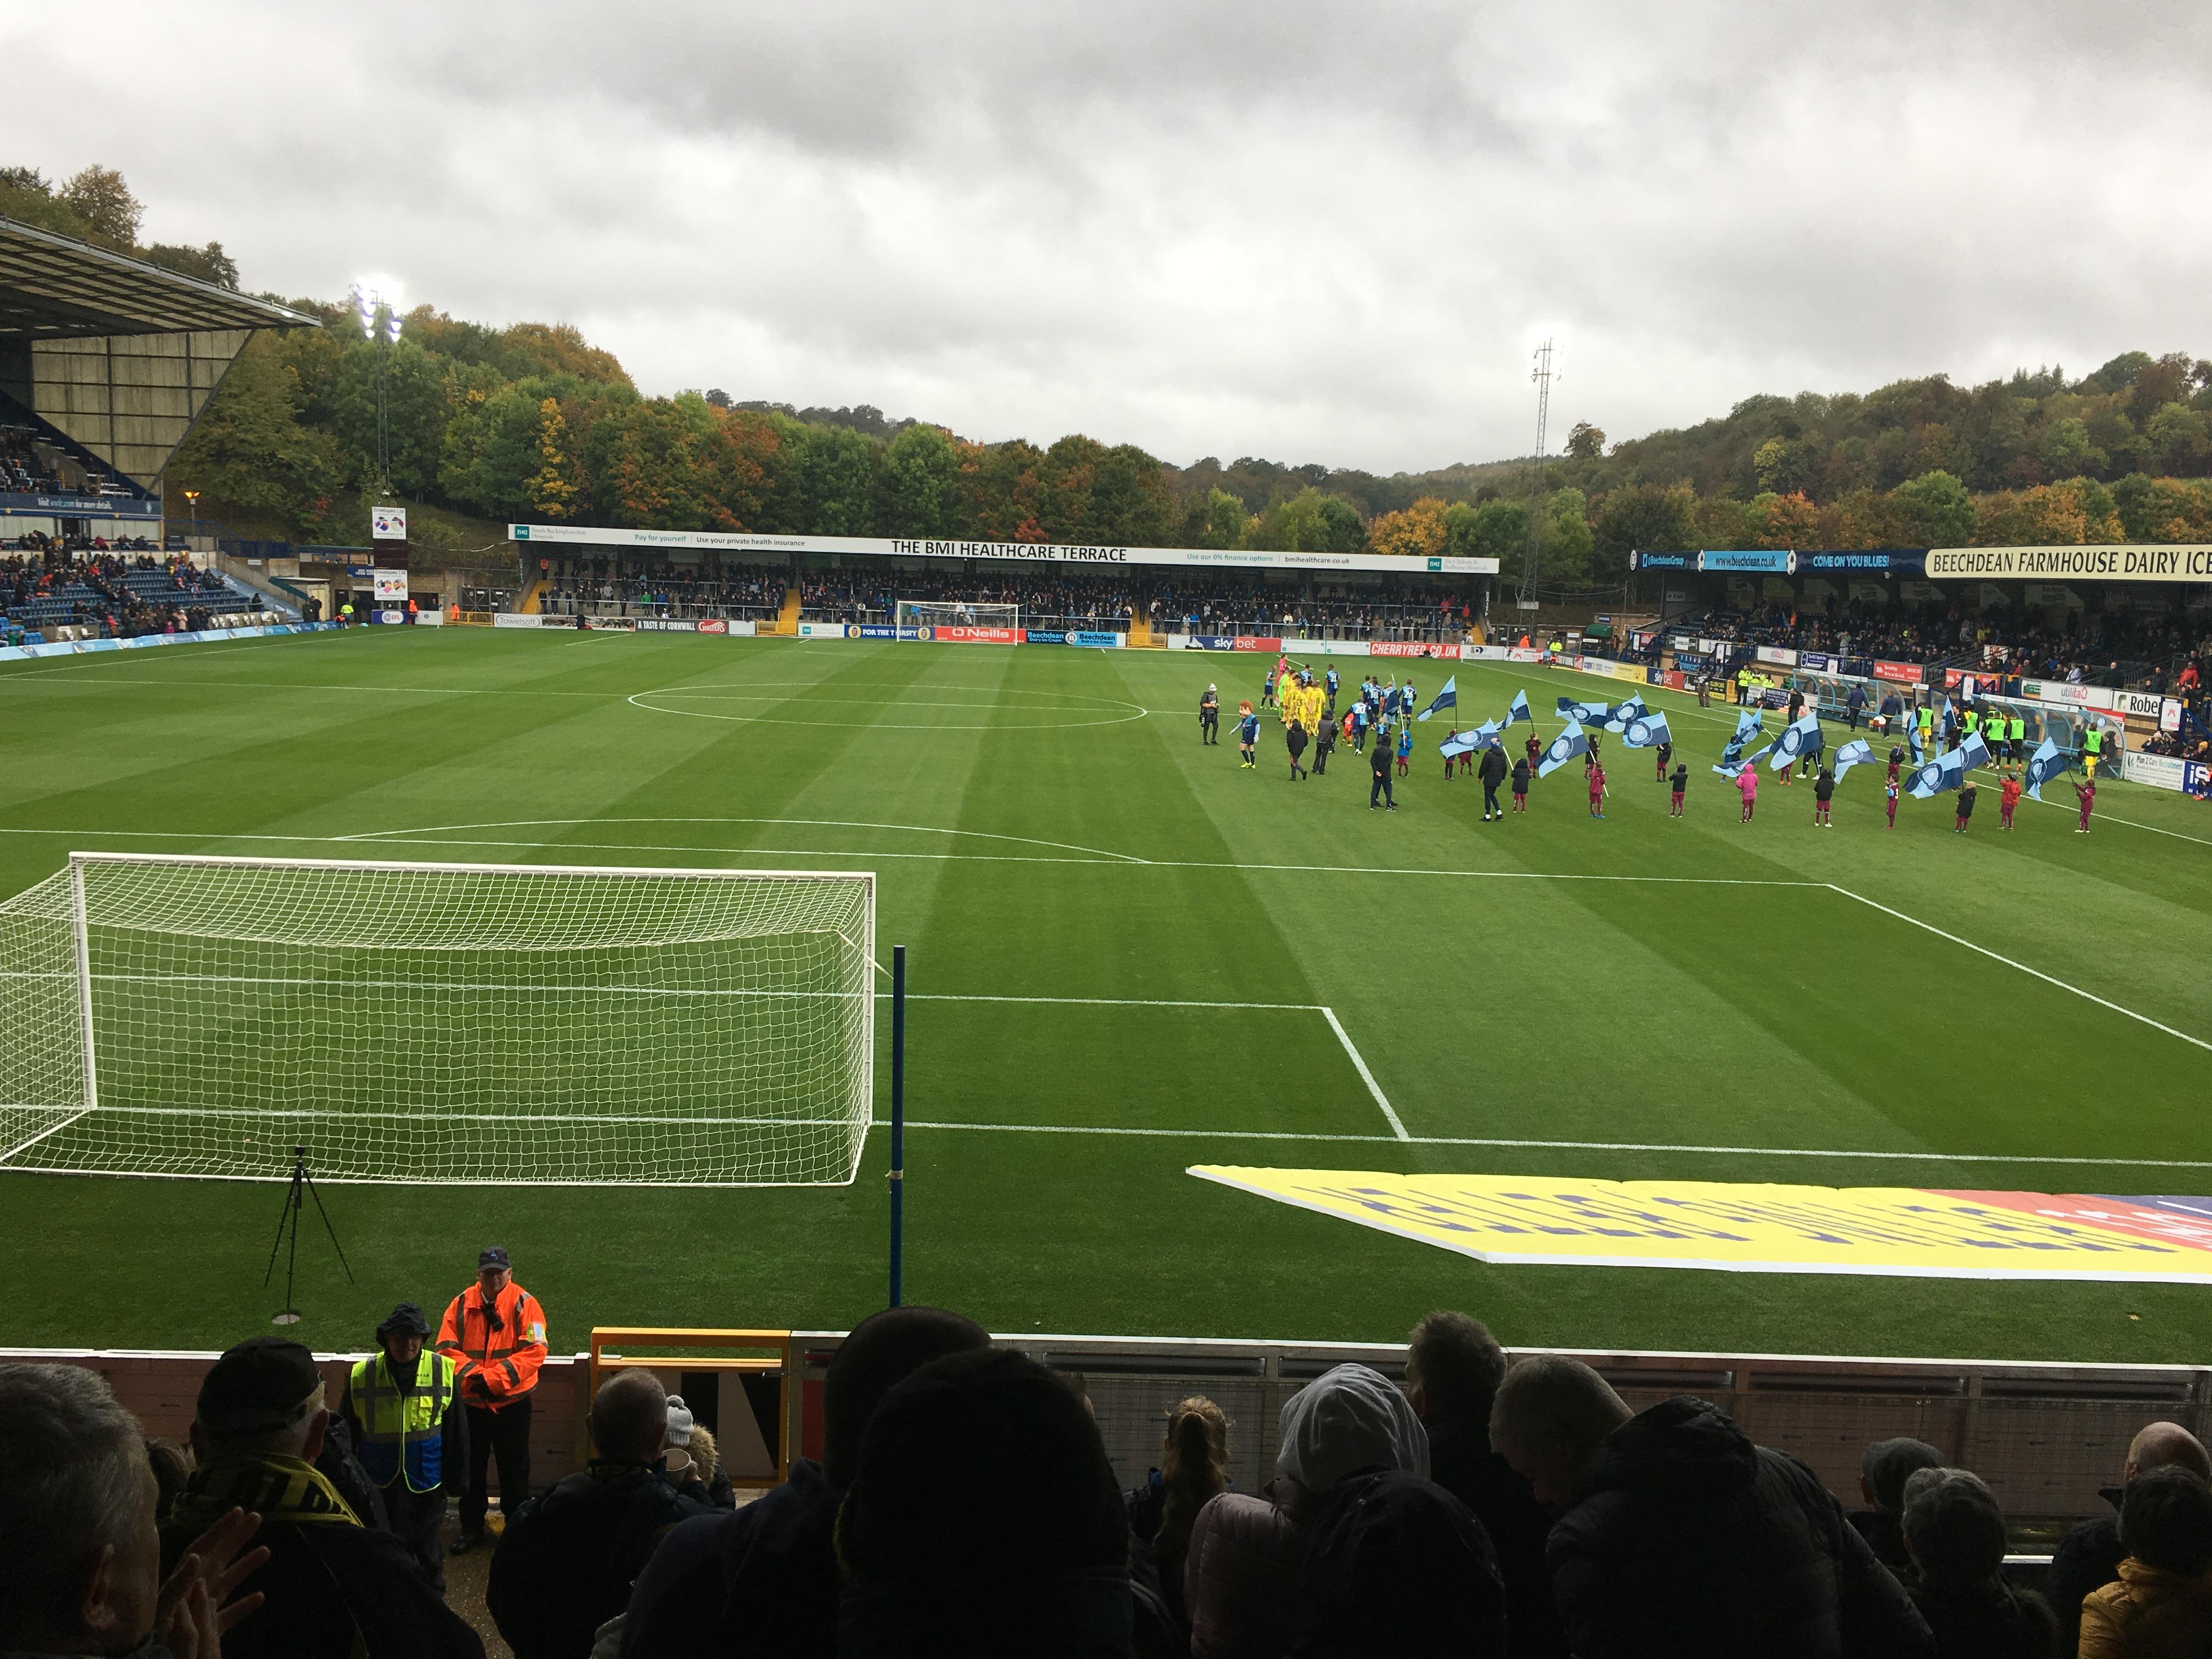 Wycombe Wanderers v Burton Albion 06-10-2018